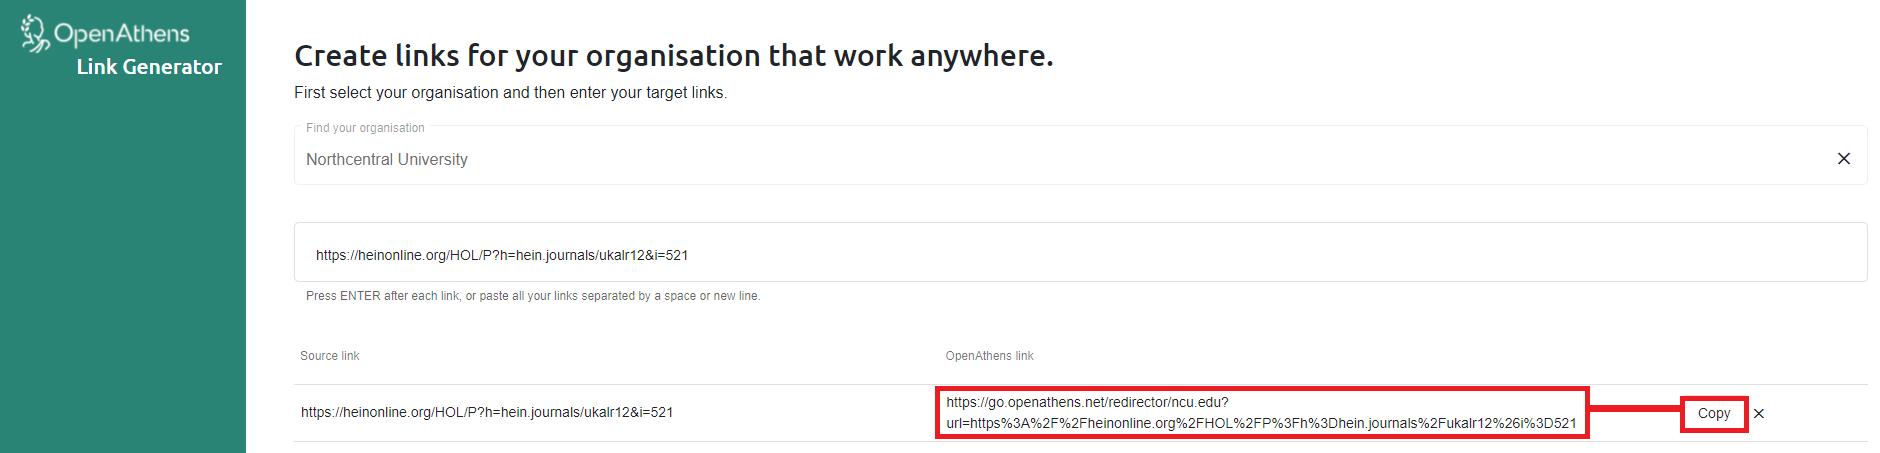 OpenAthens Redirector Link Generator to create a resource permalink for HeinOnline